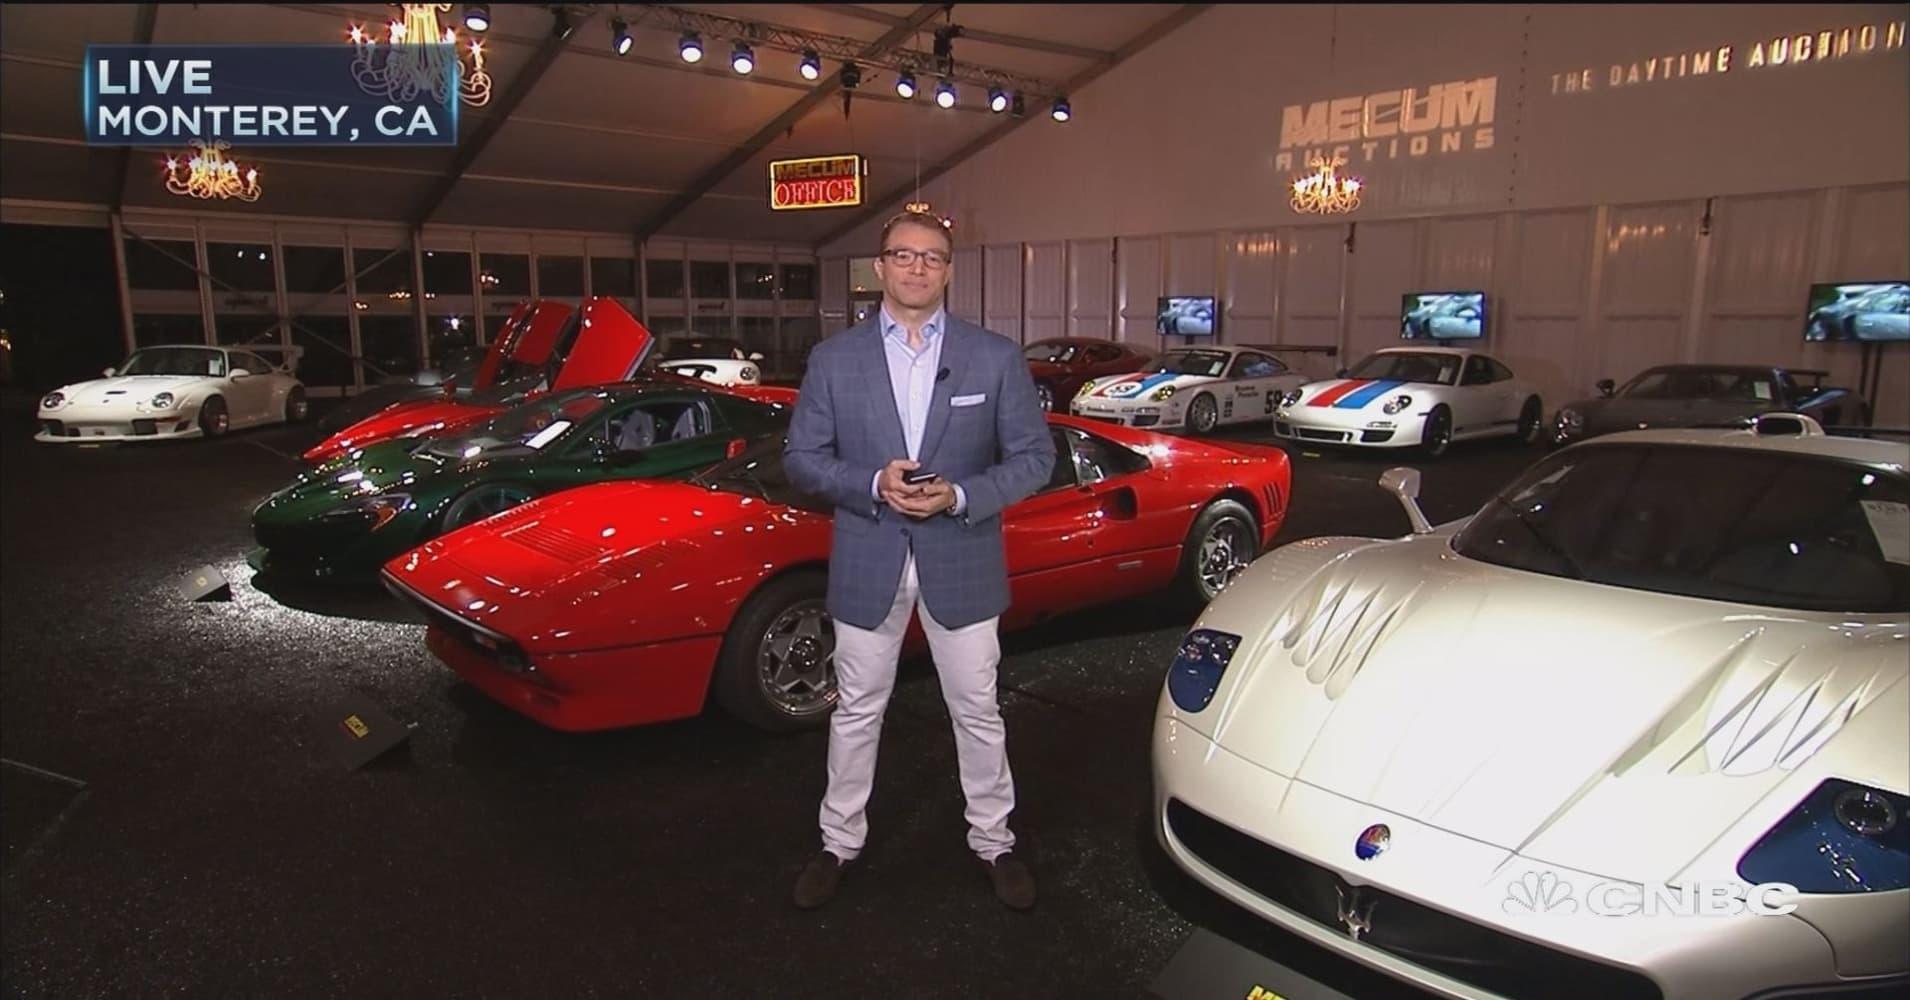 Pebble Beach car auctions top $400 million